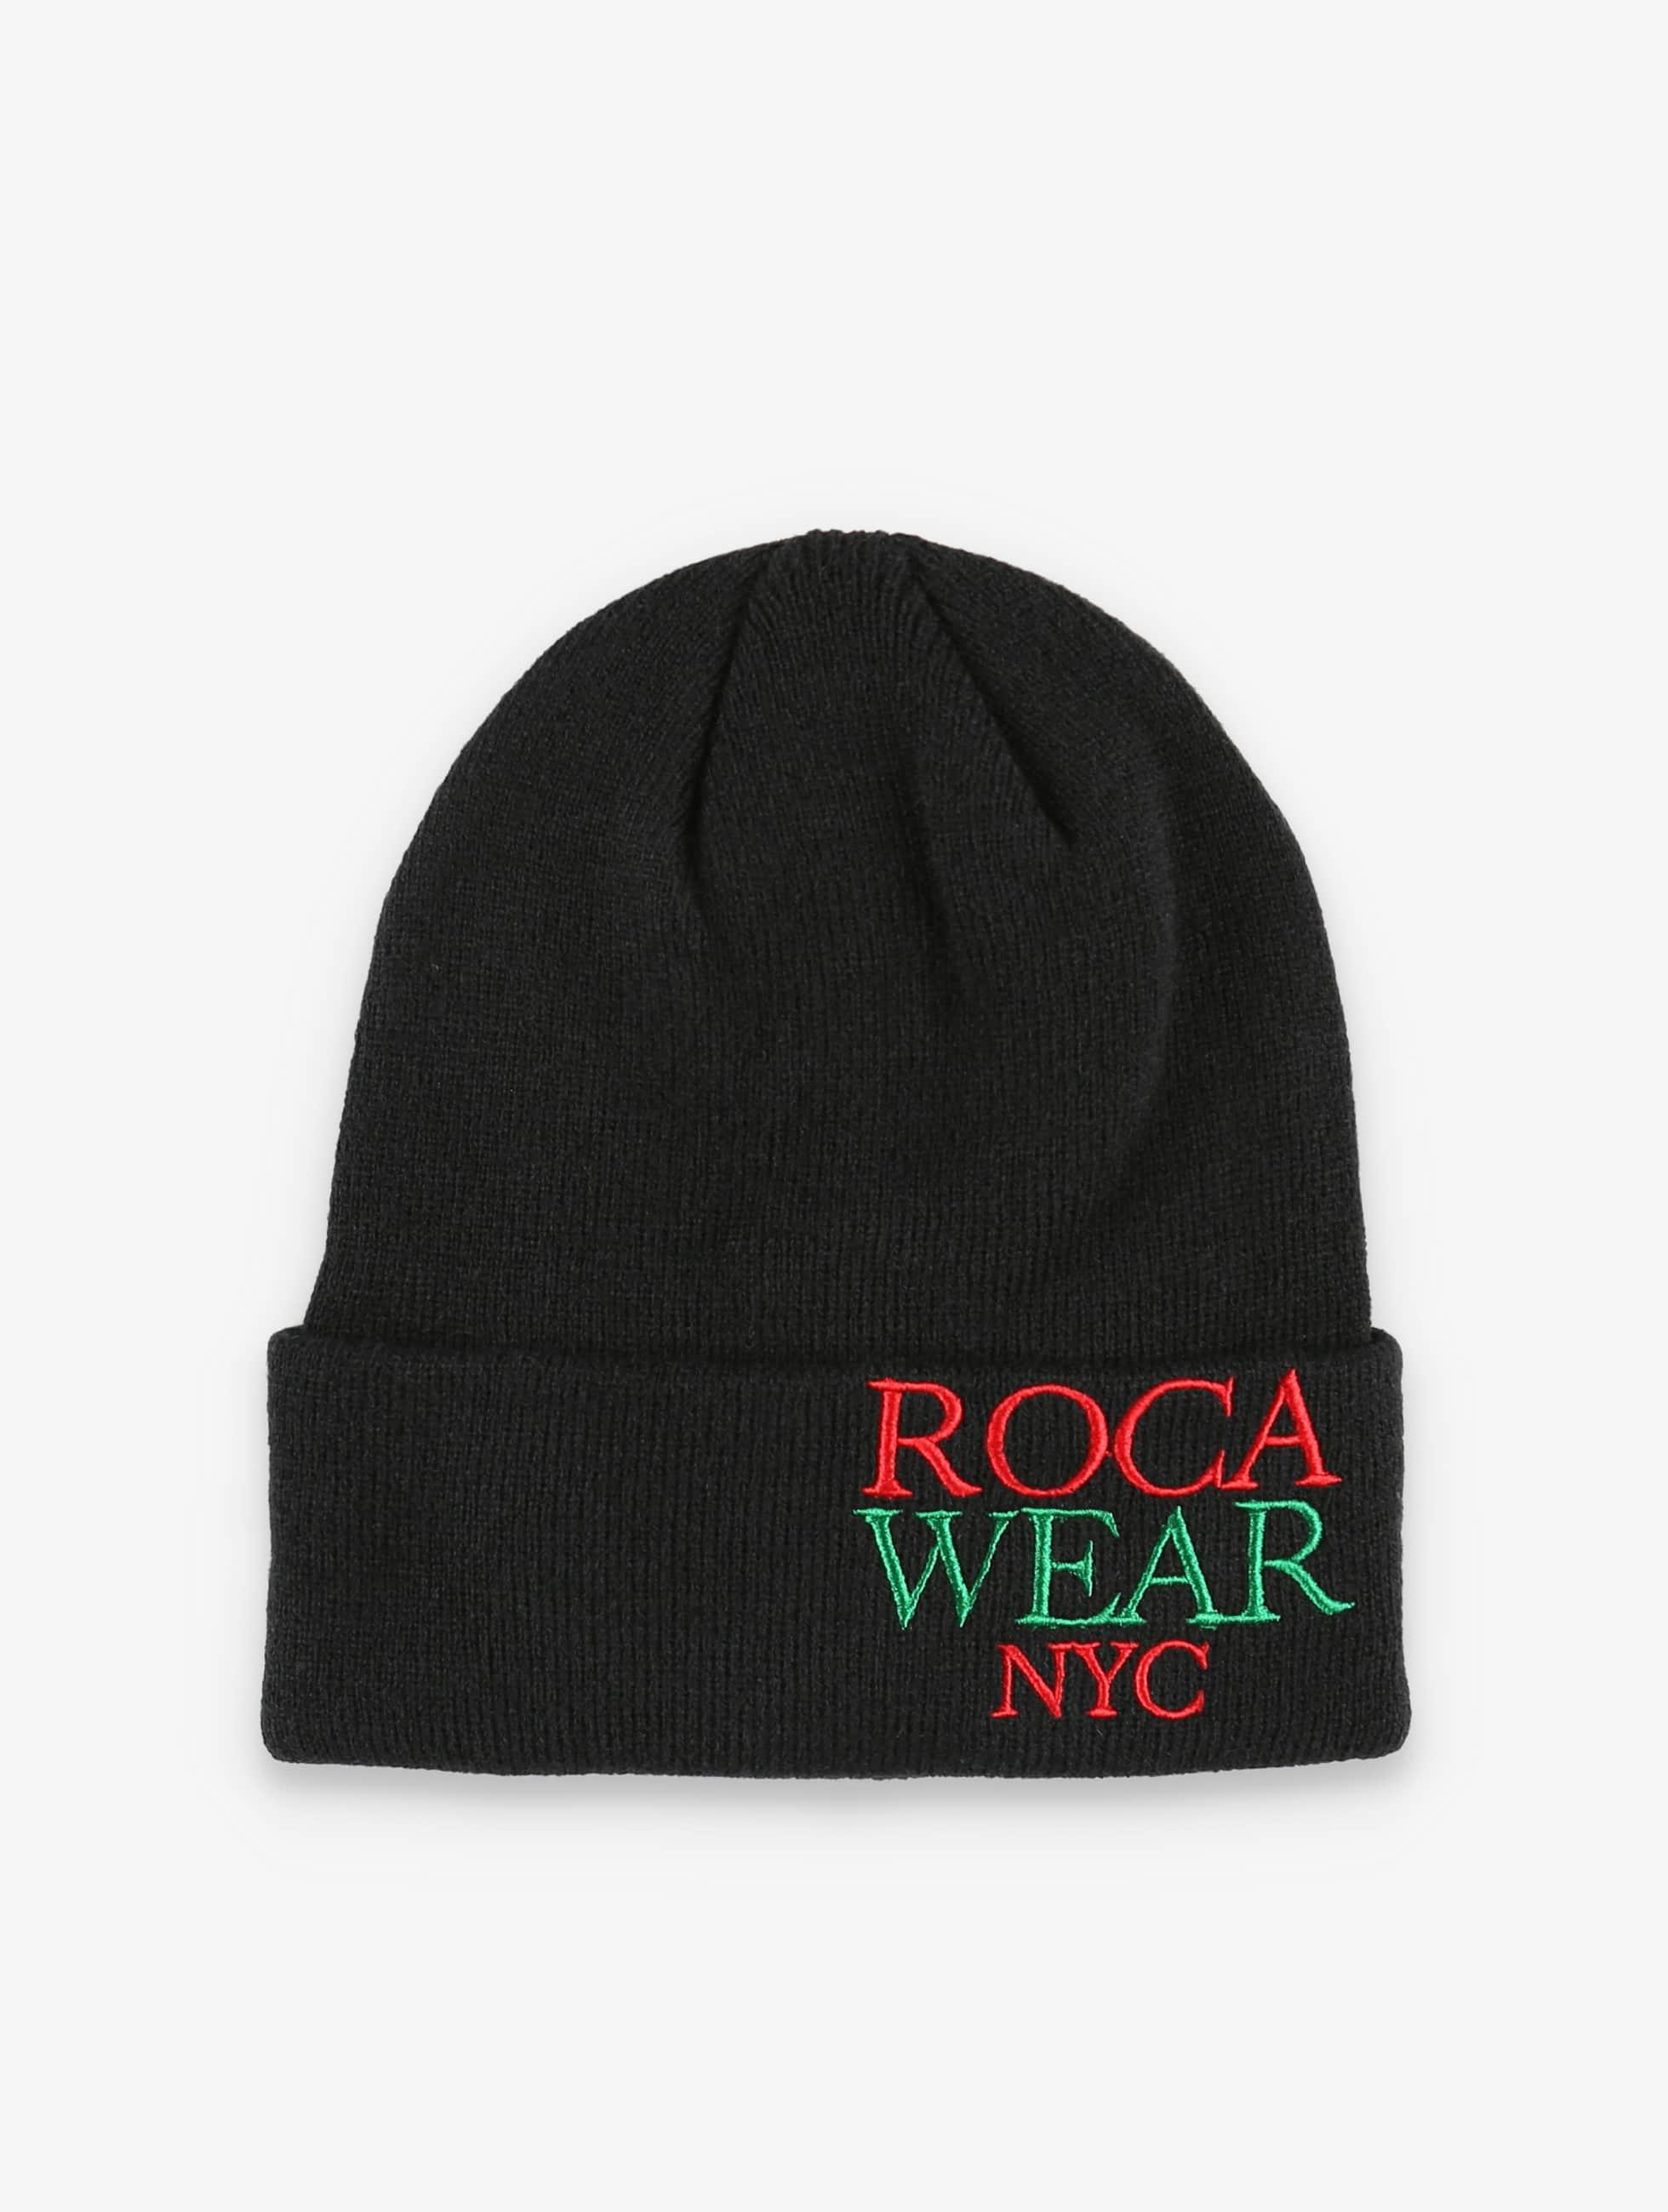 Rocawear / Beanie NYC in black One Size